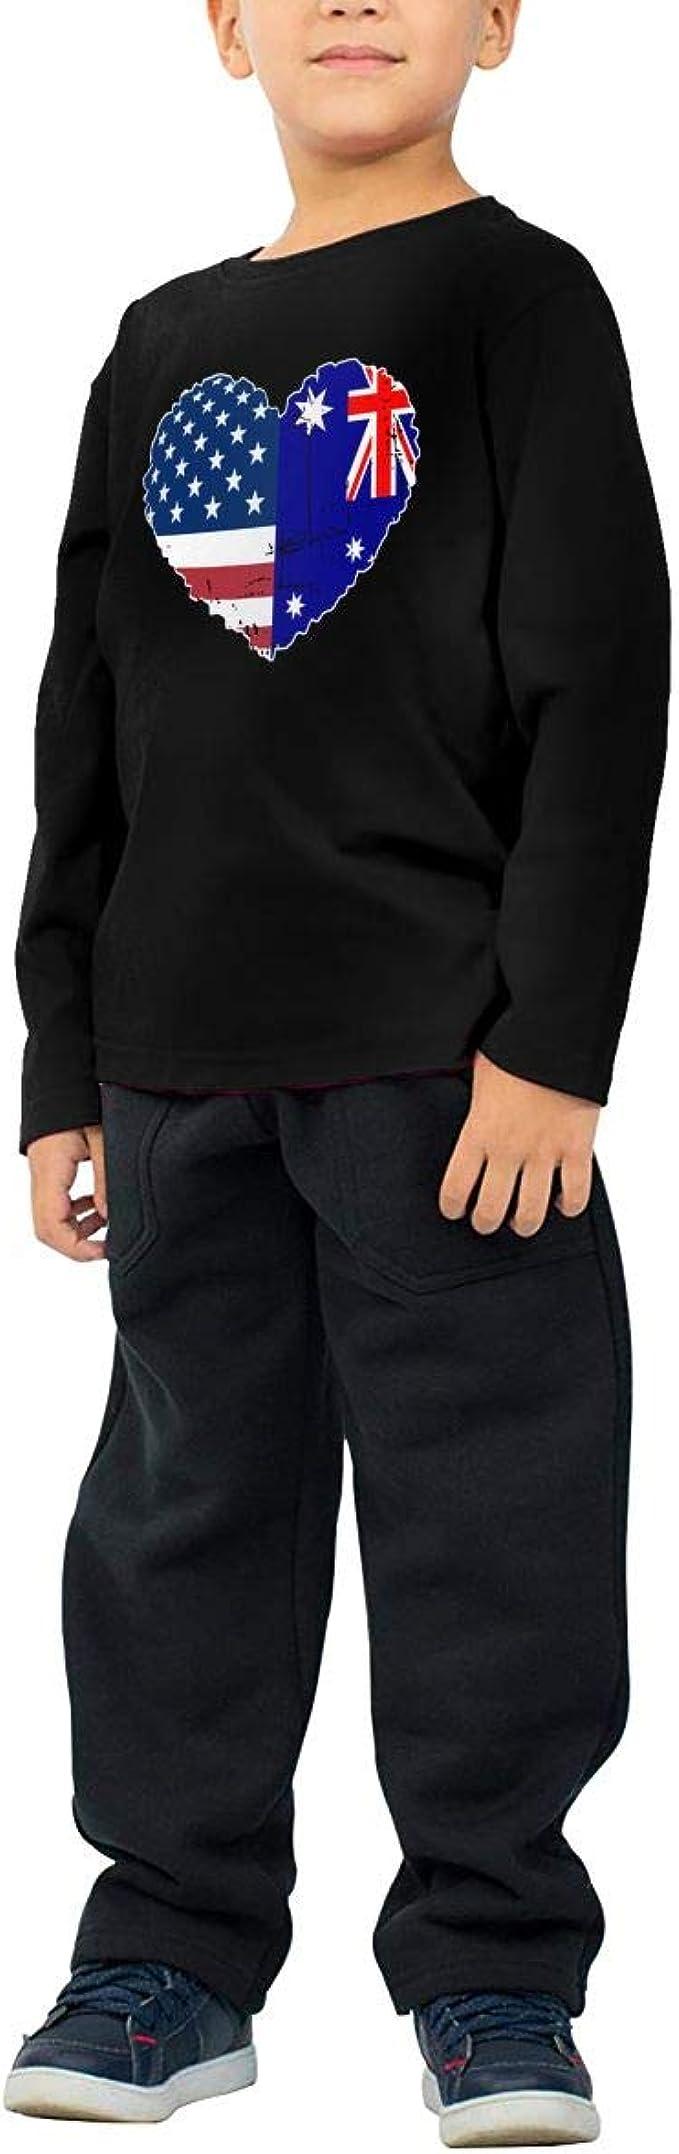 CERTONGCXTS Childrens Curling Sport Soft Short Sleeve T-Shirt Size 2-6